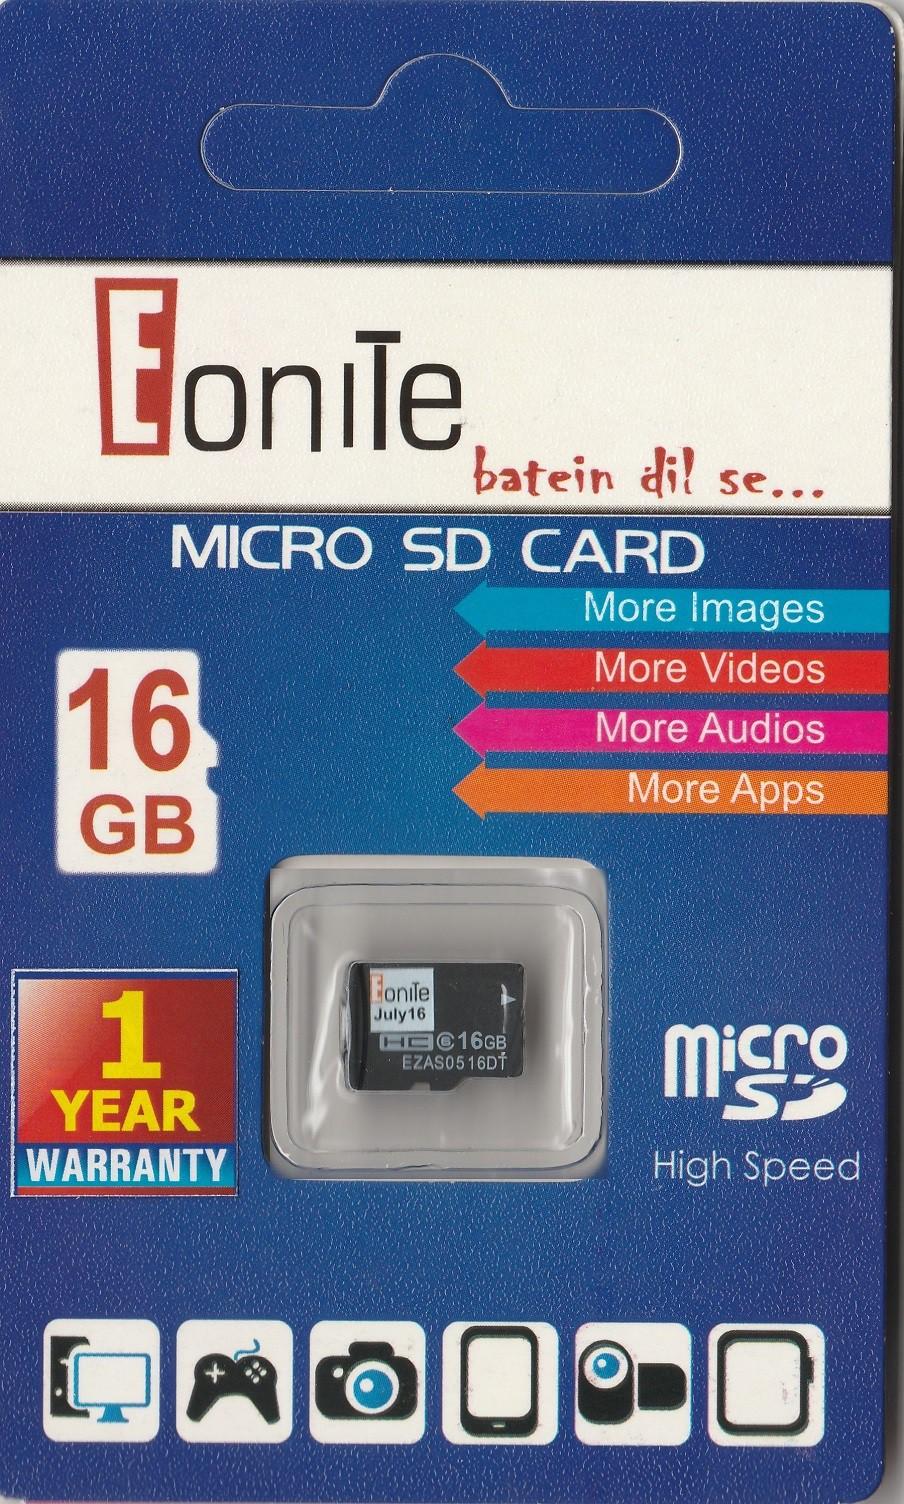 Memory Cards Sandisk Micro Sd New 48 Mb S 16gb Ultra Uhs 1 Class 10 Sdsqunb En3 16 Gb Microsd Card